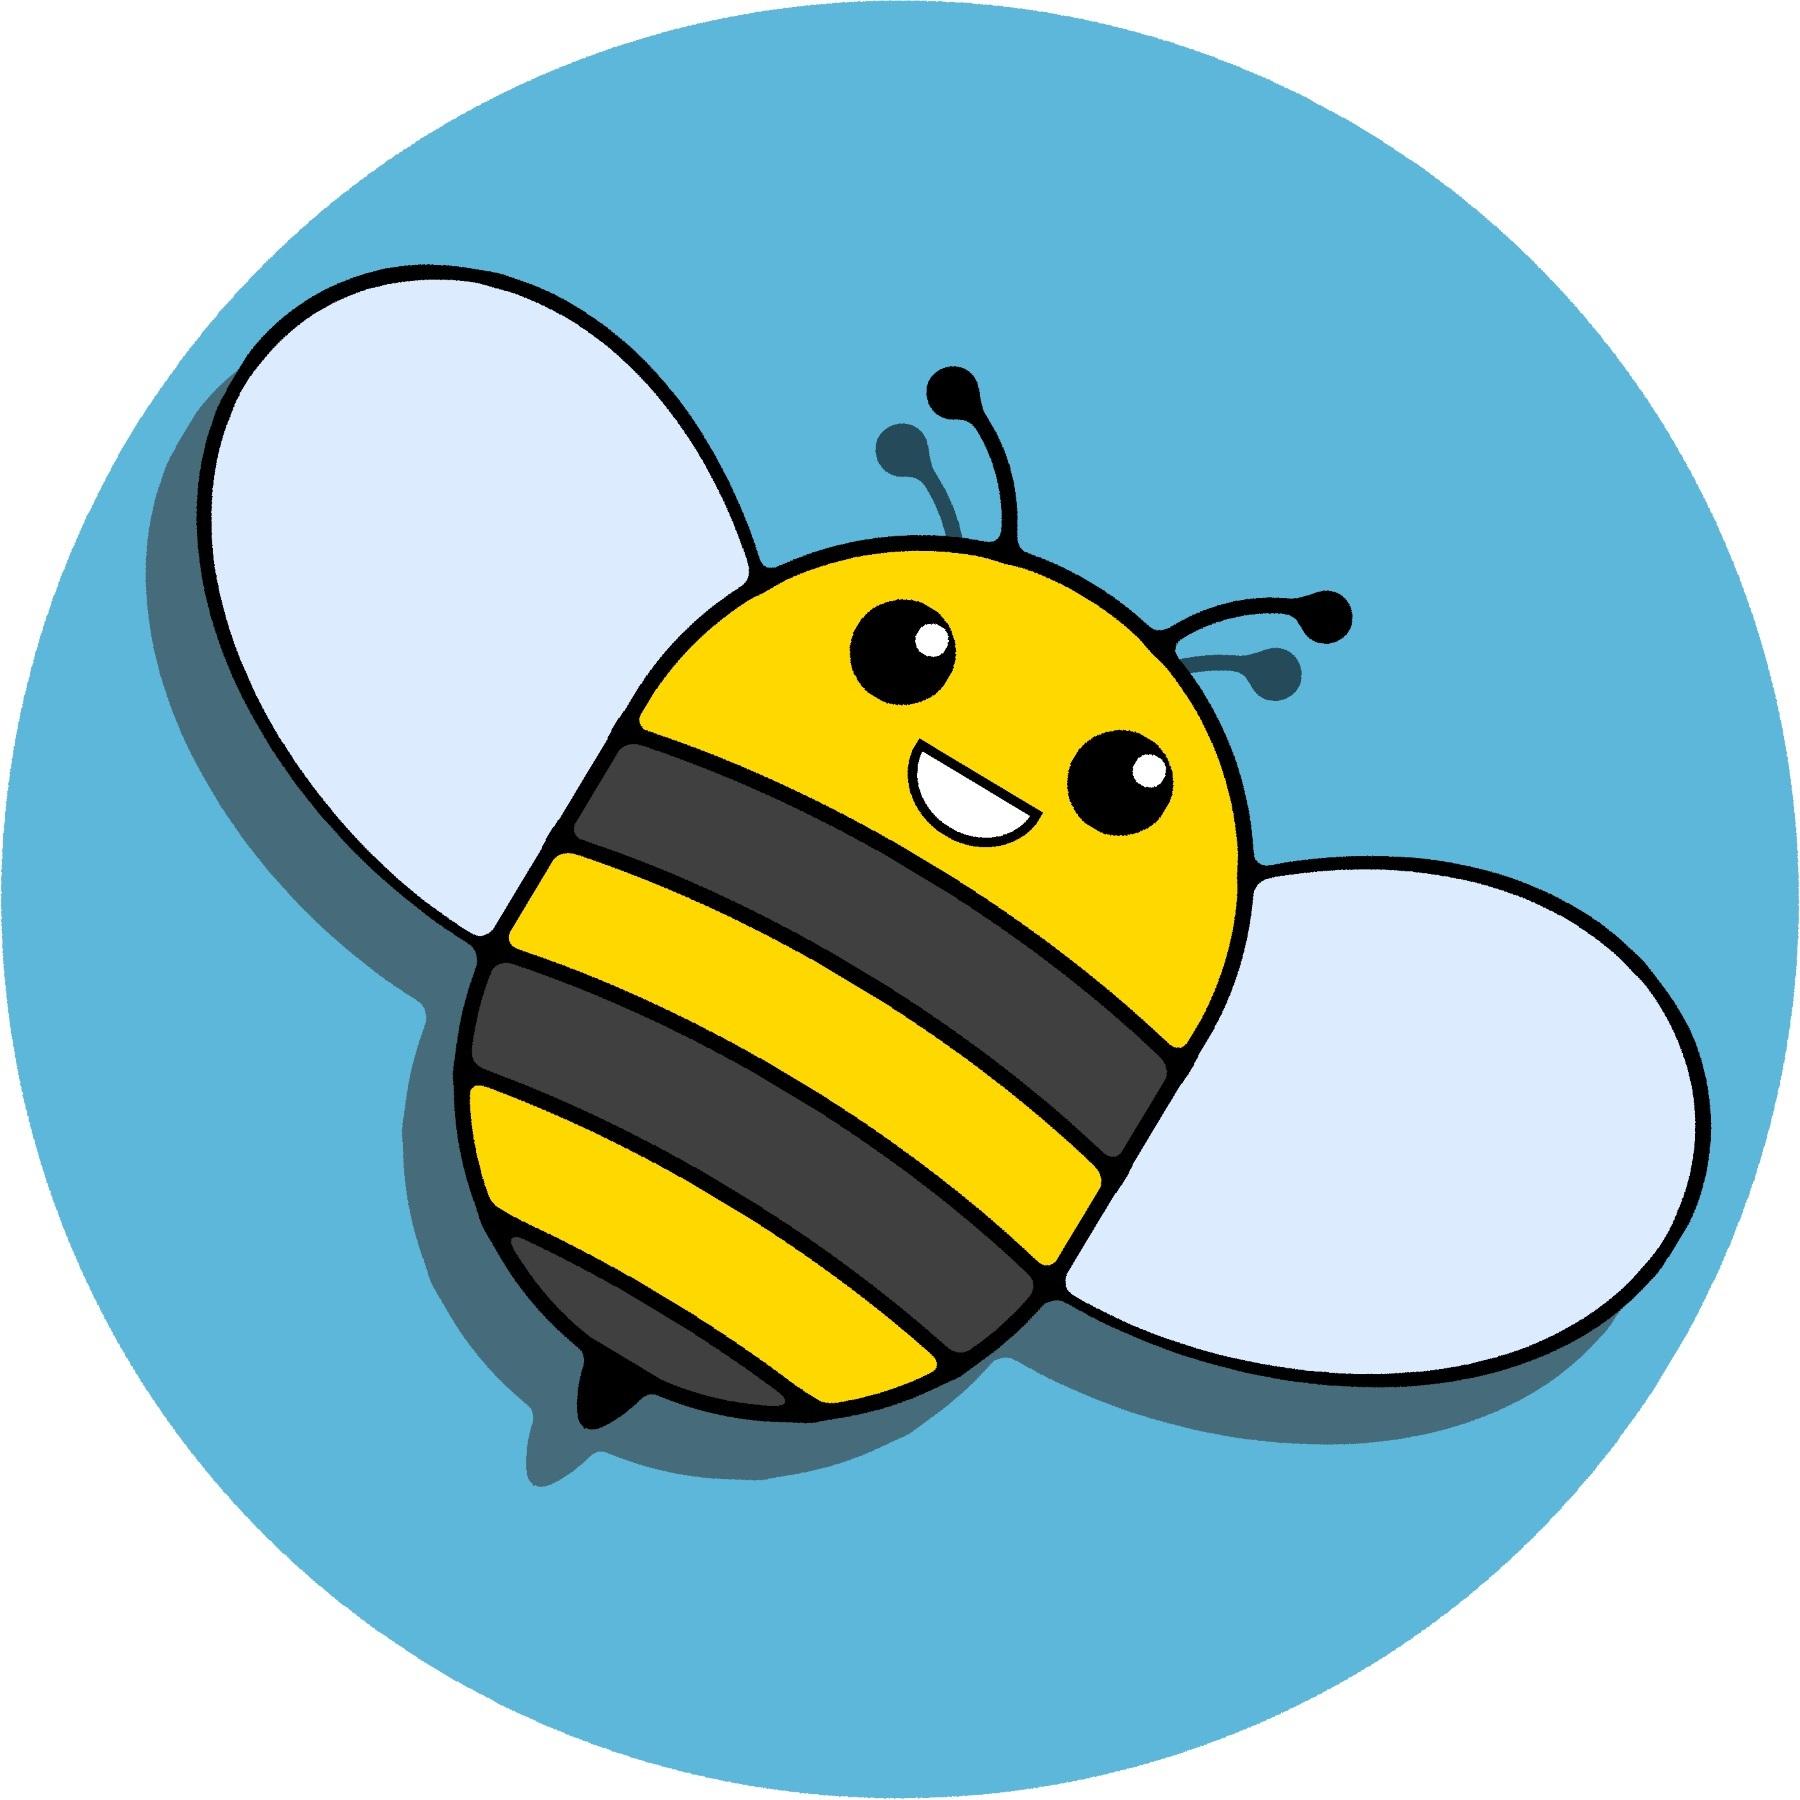 Bumble Bee - Bumble Bee